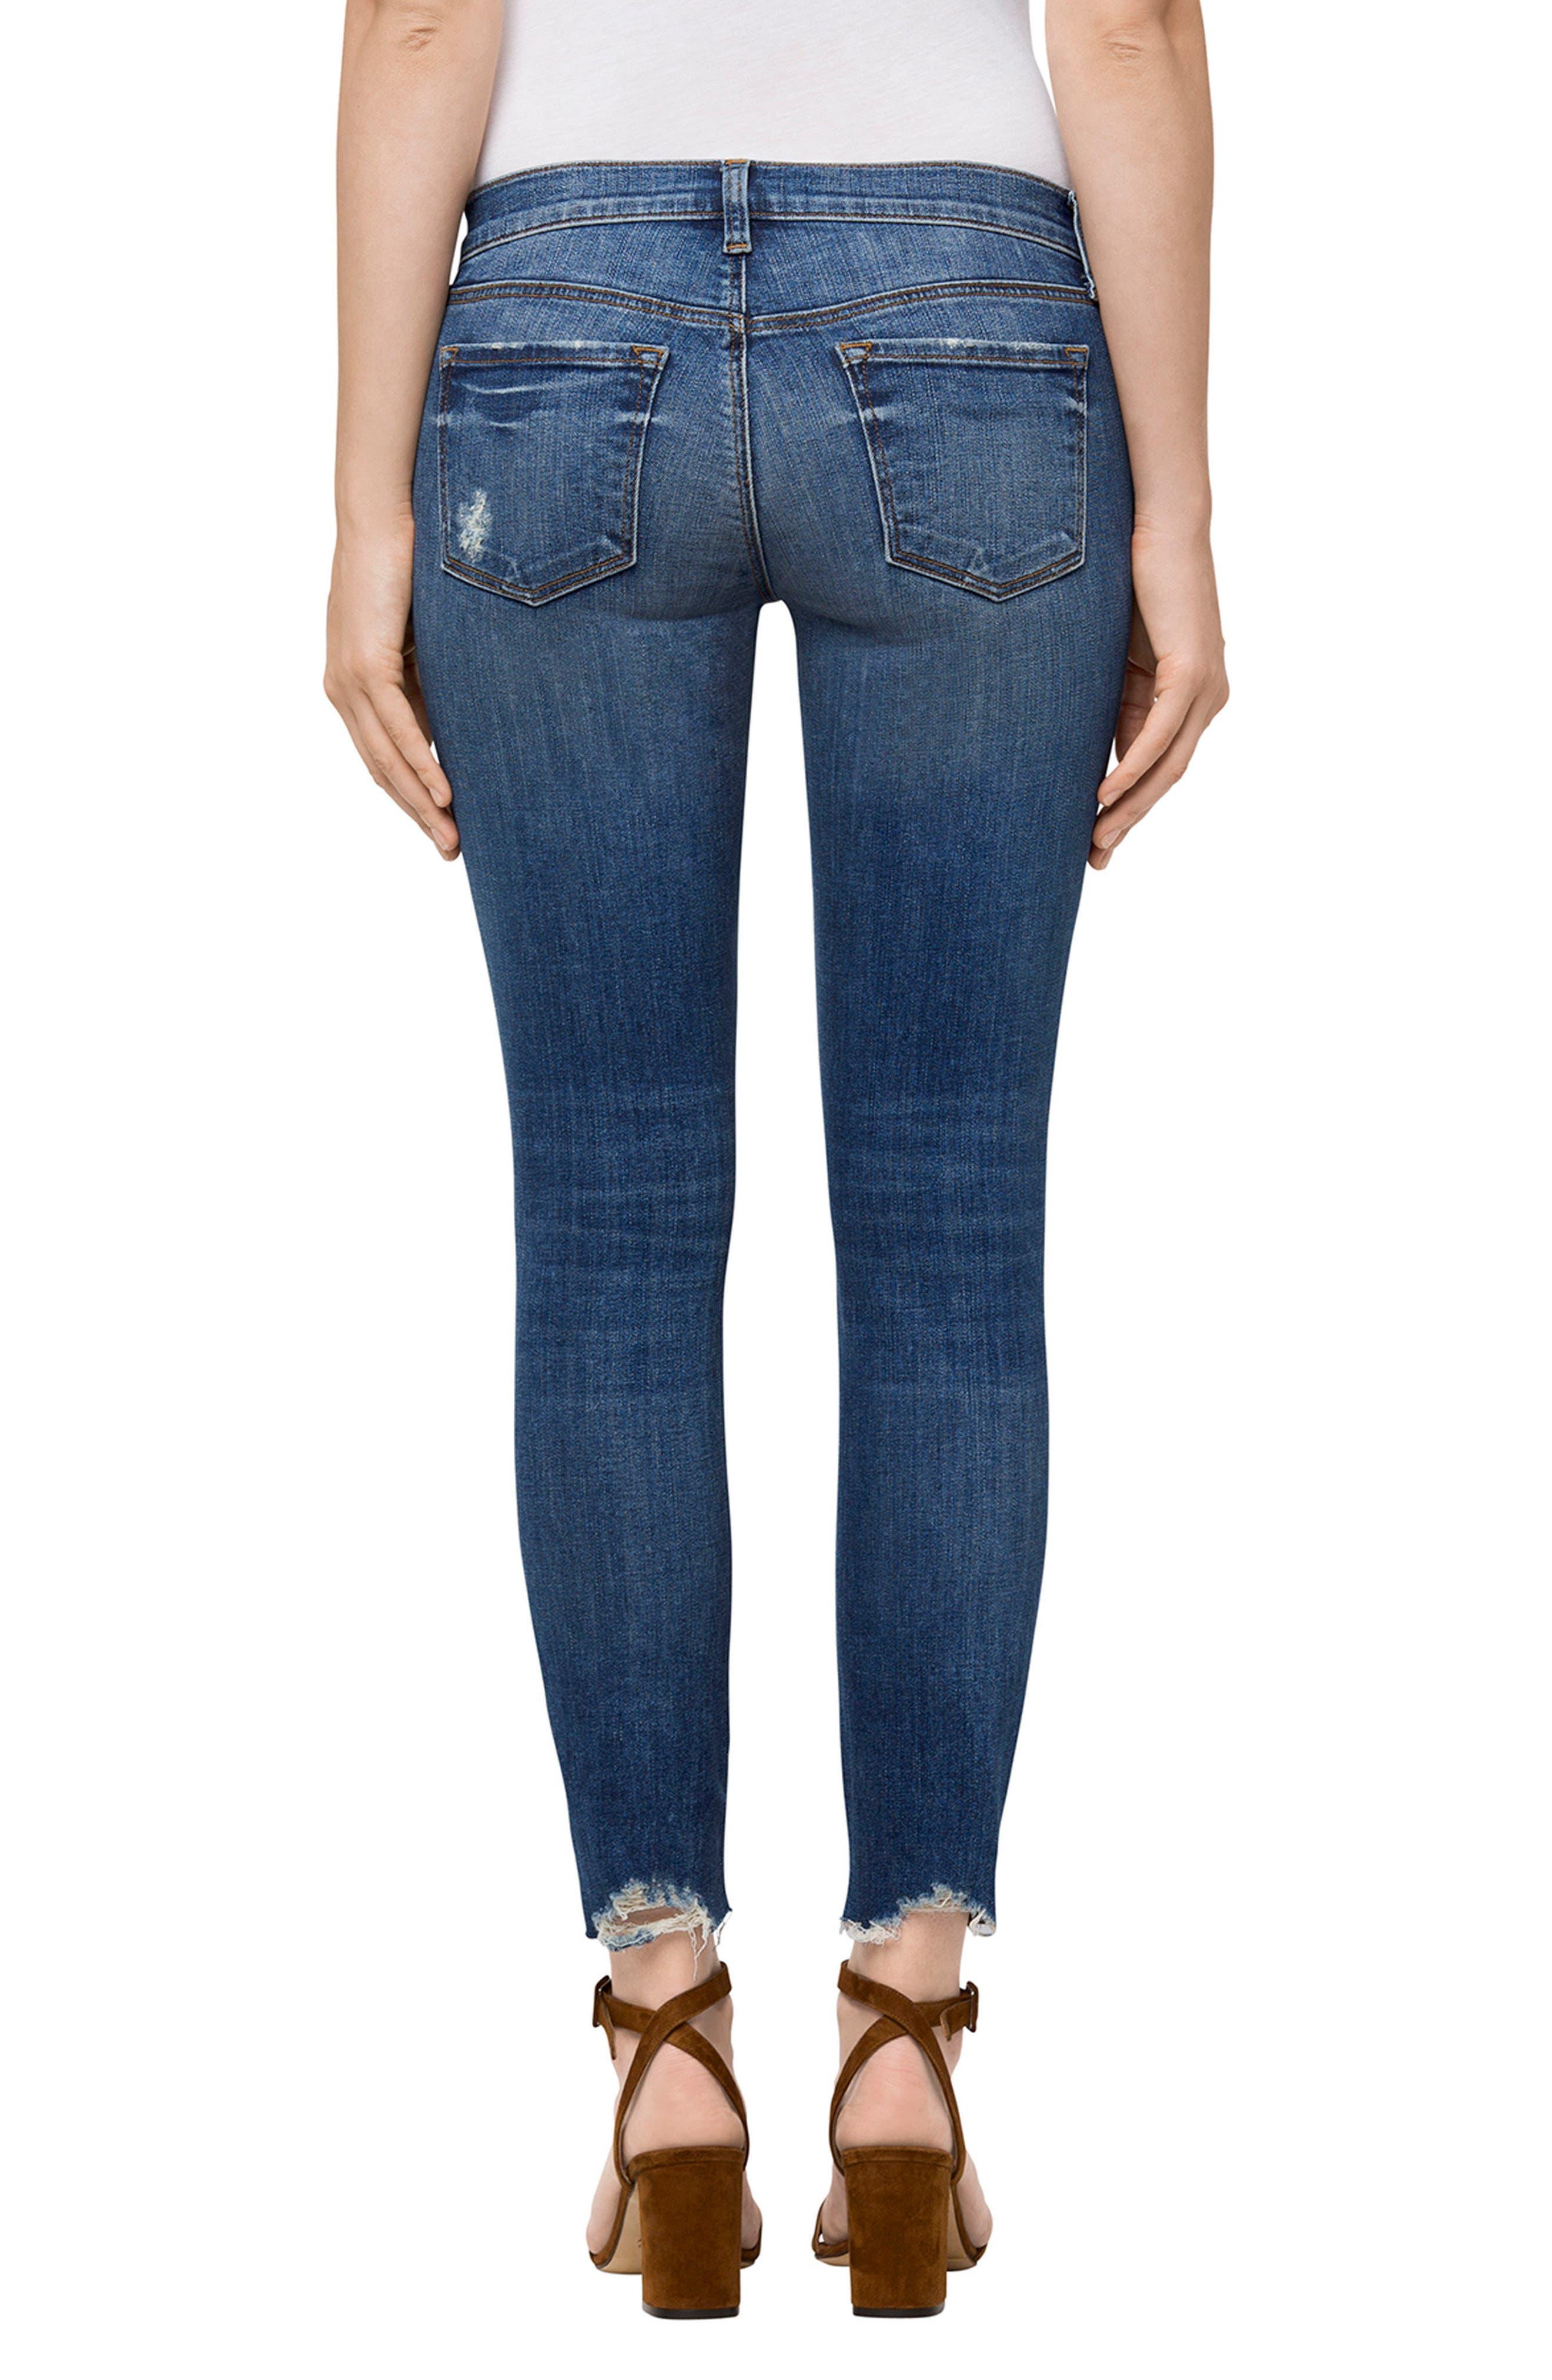 9326 Low Rise Crop Skinny Jeans,                             Alternate thumbnail 2, color,                             Revoke Destruct